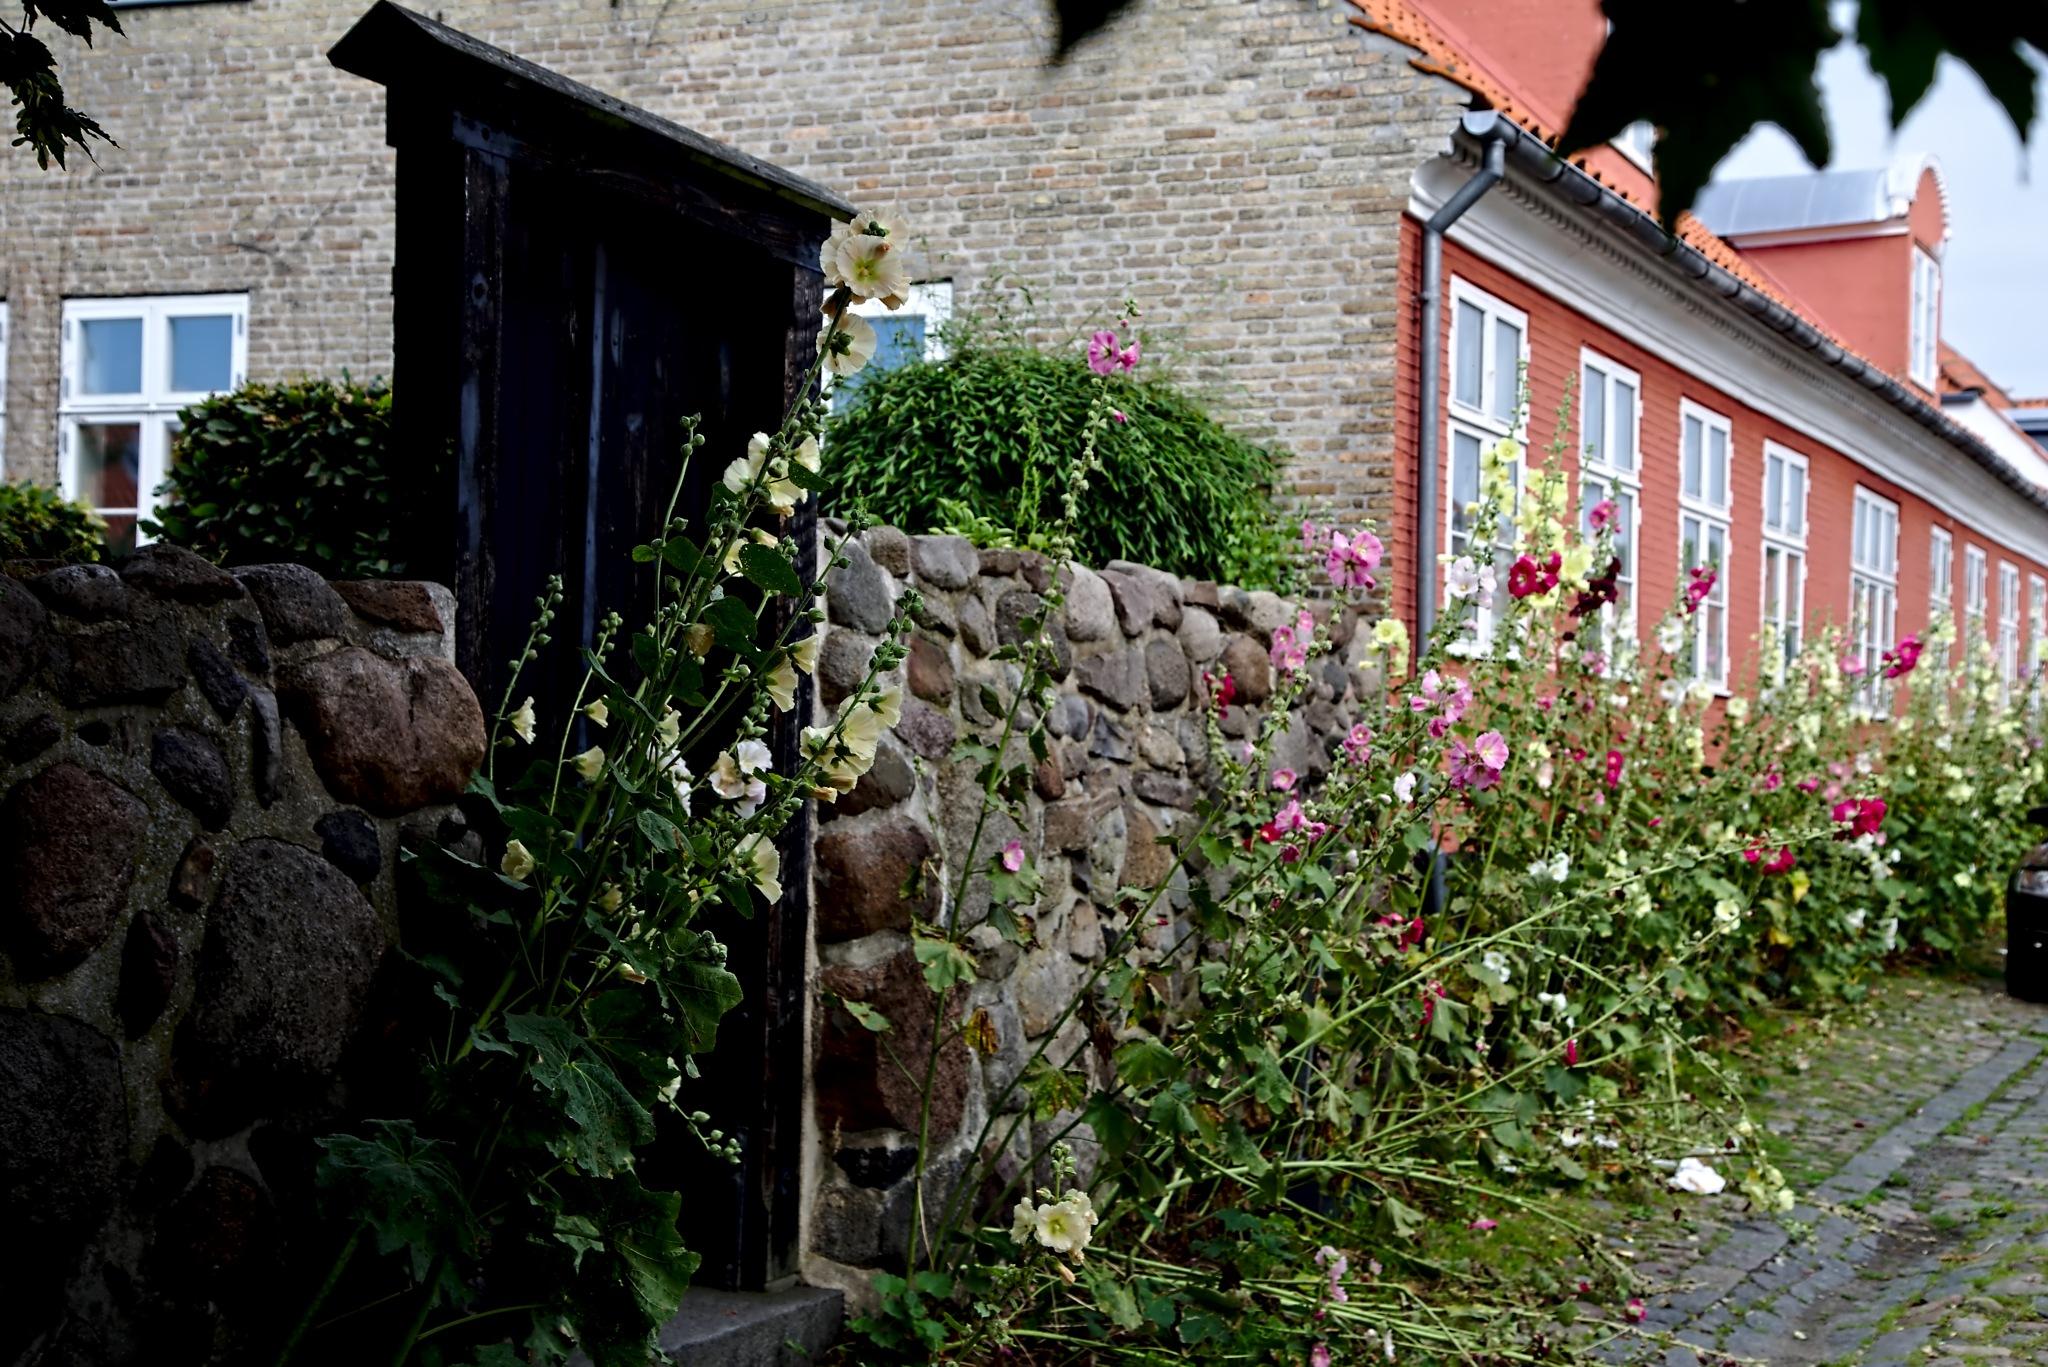 Street veiw from Ronne by Anders Weinberg